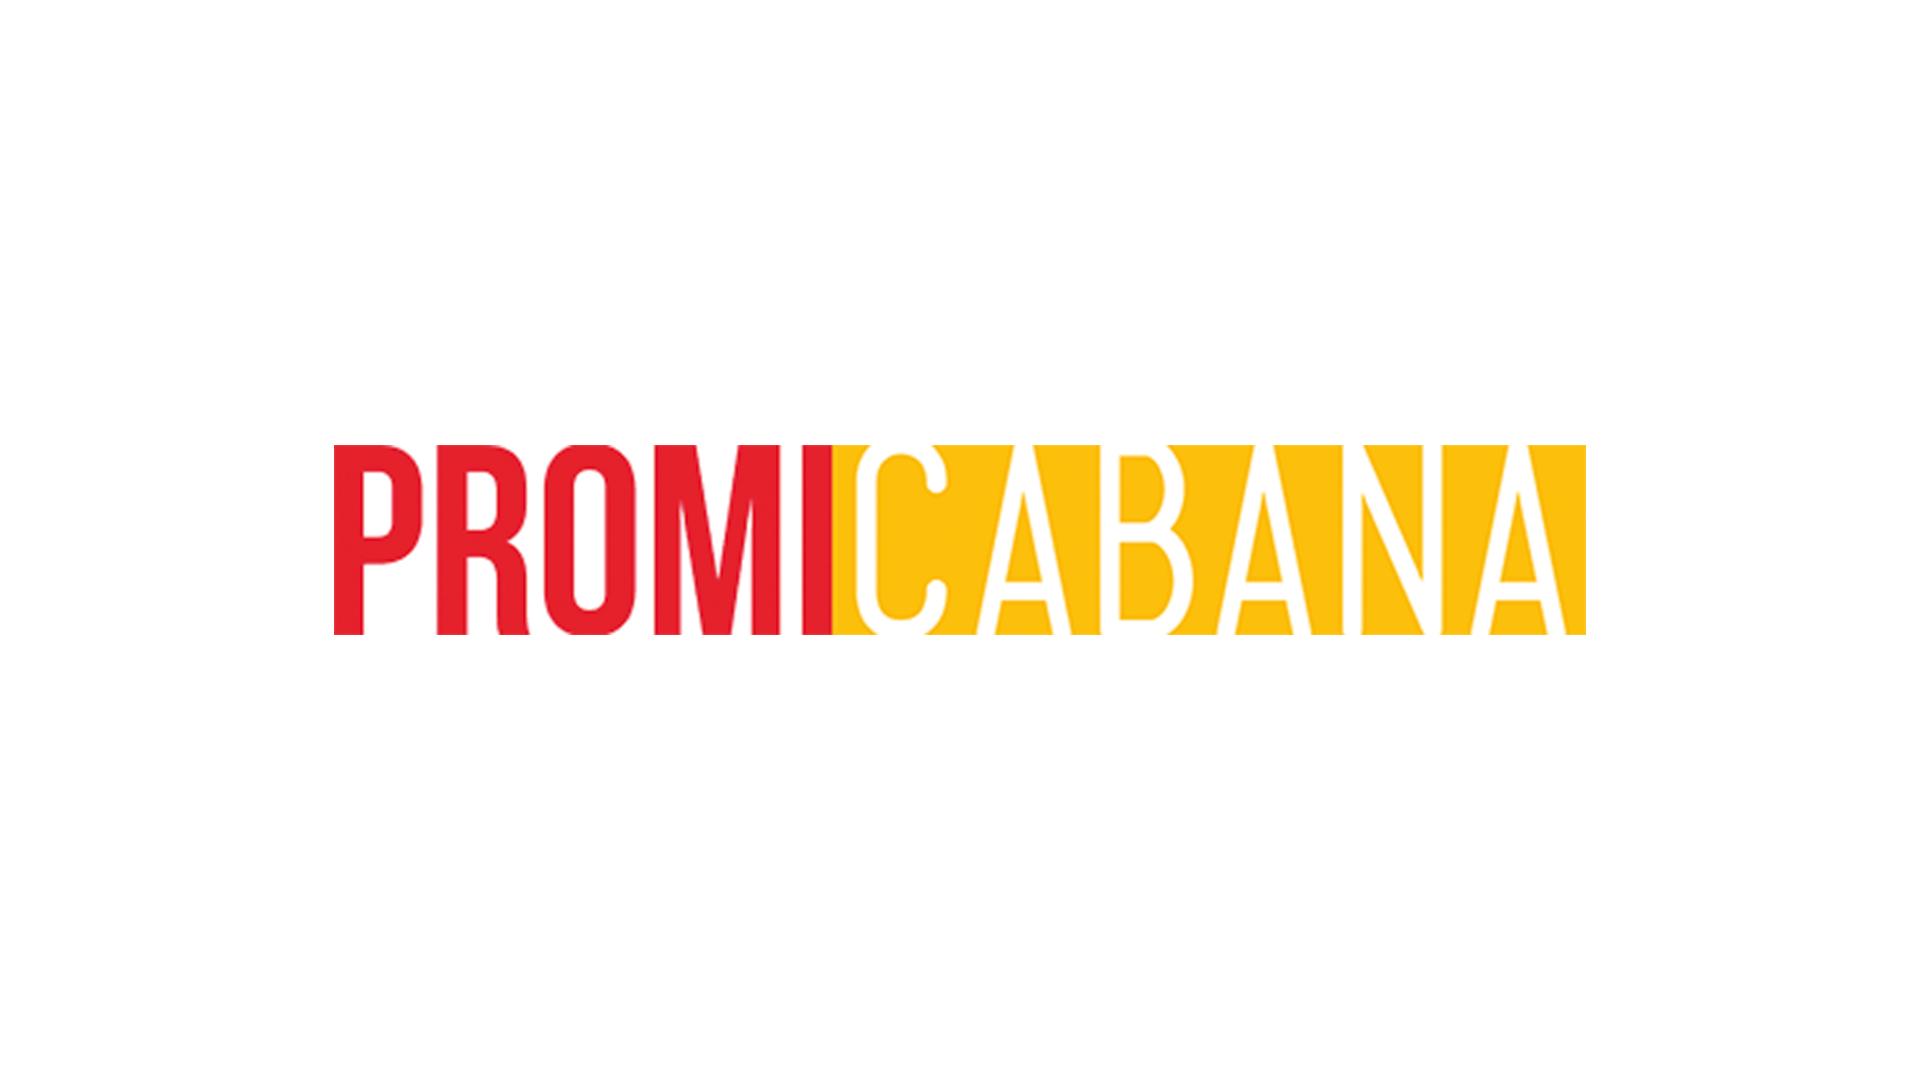 Katy Perry Trägt Jetzt Raspelkurze Haare In Platinblond Promicabana